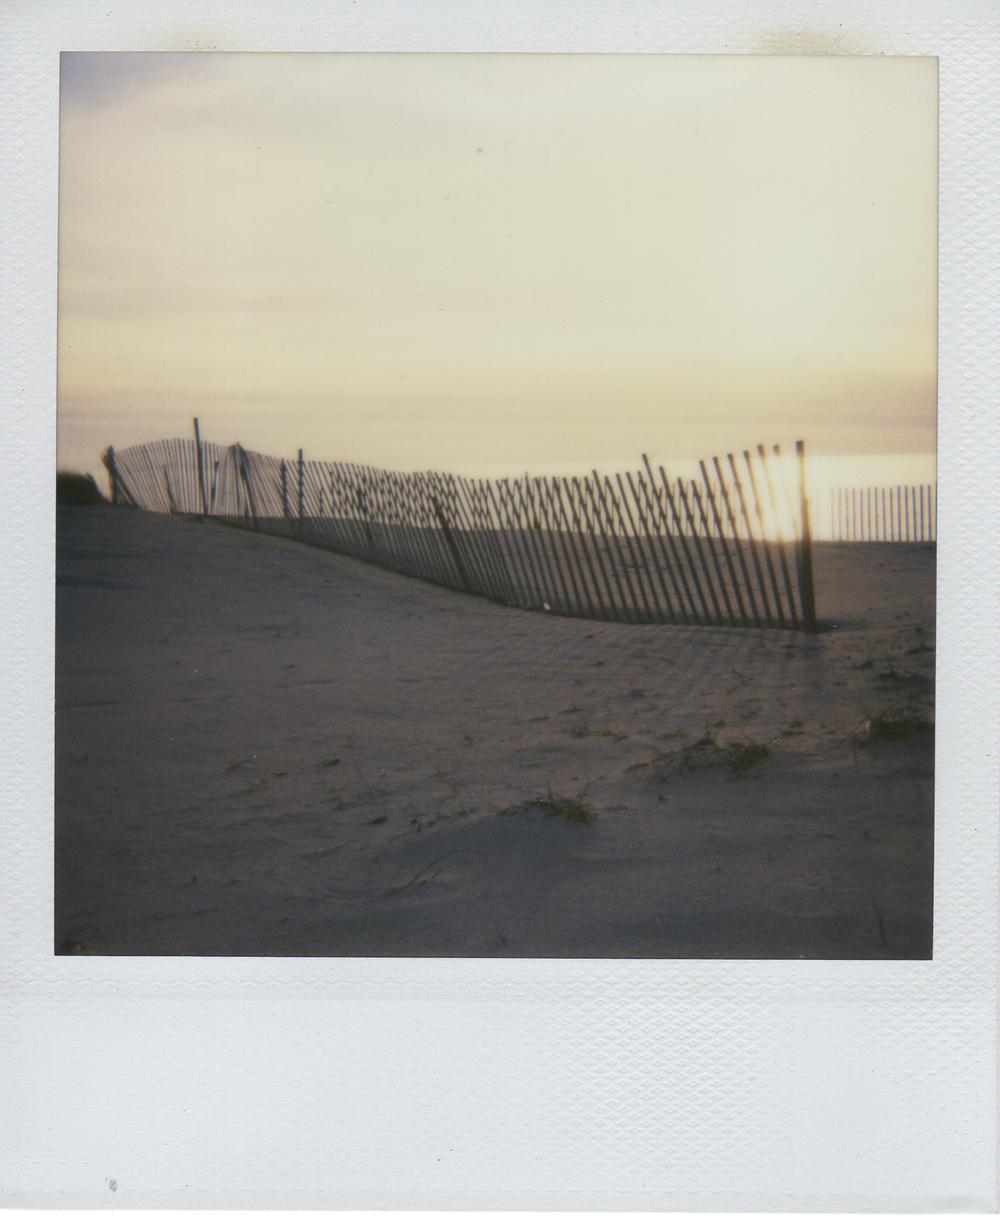 jlaurence-polaroid-033.jpg